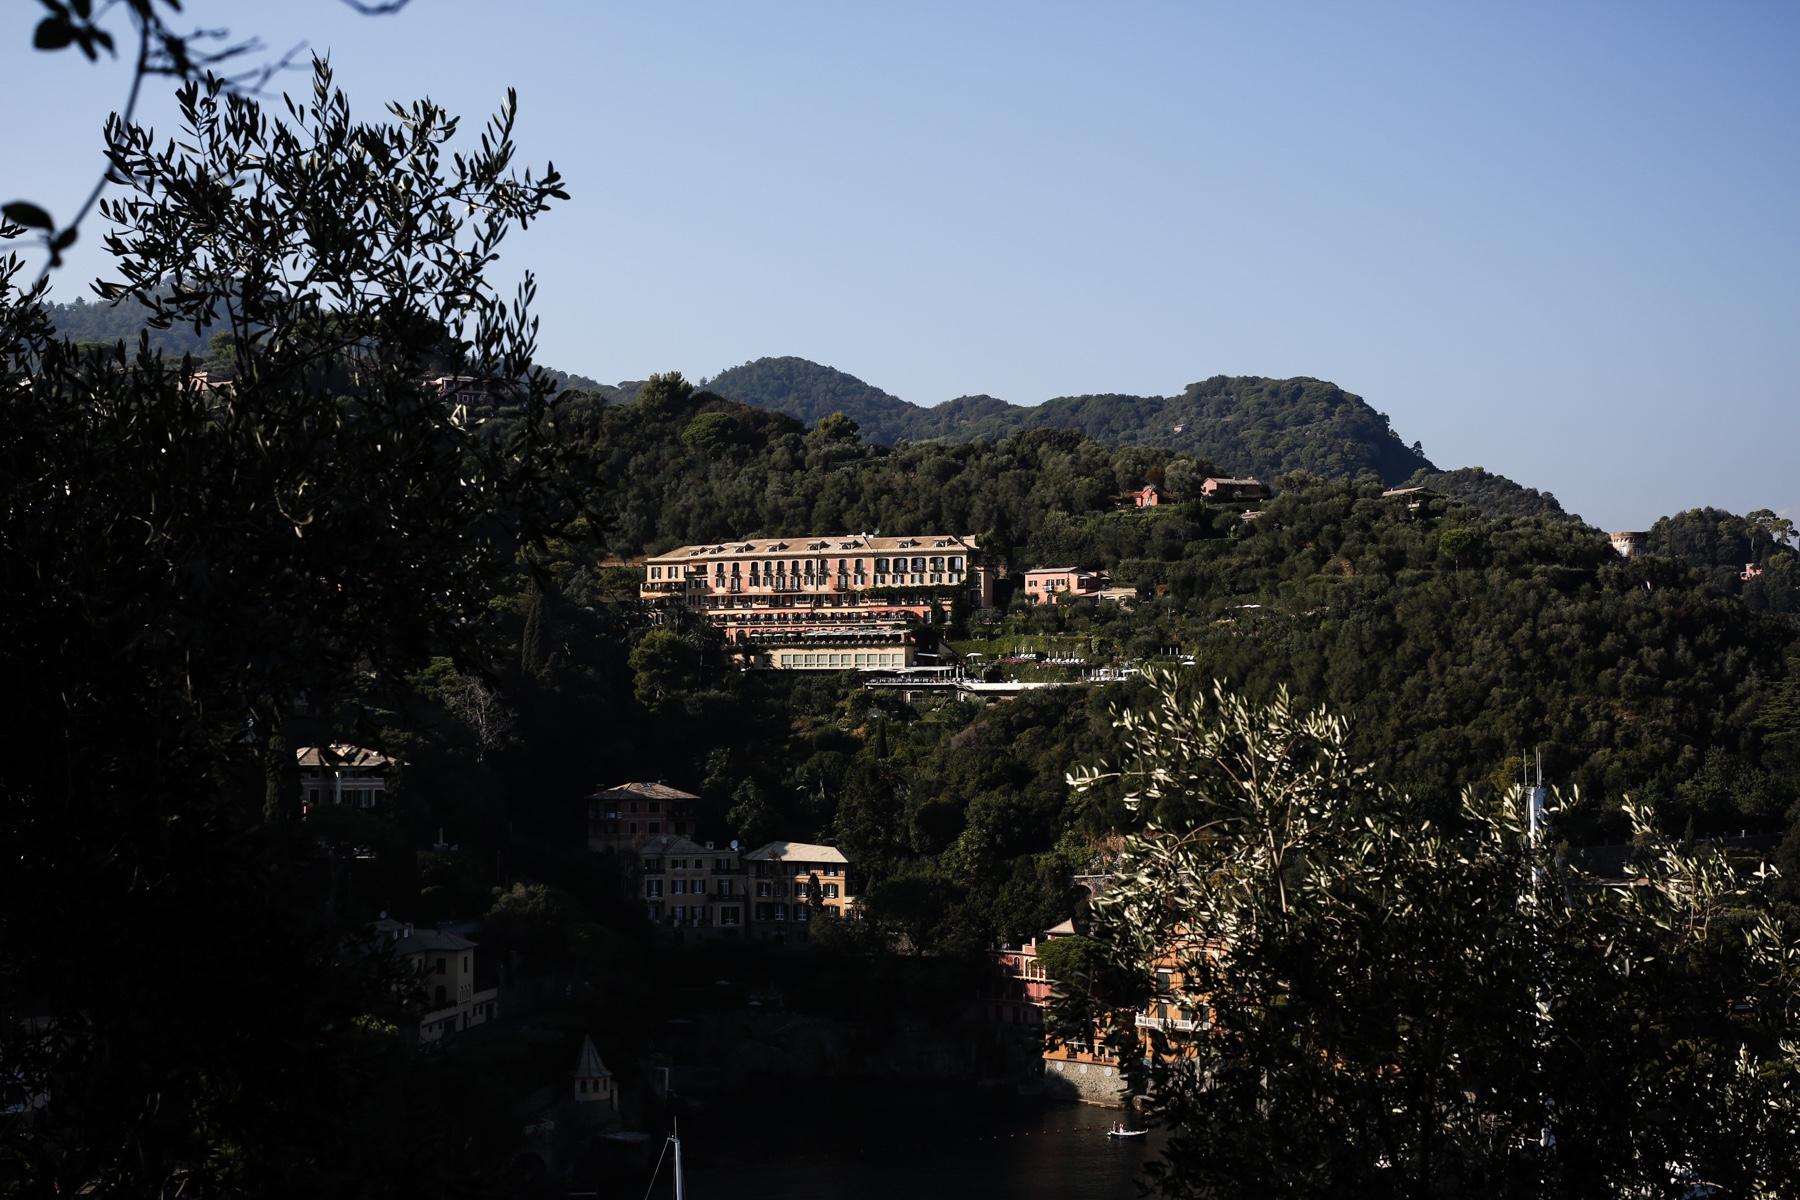 style-shiver-travel-ligurien-italien-29